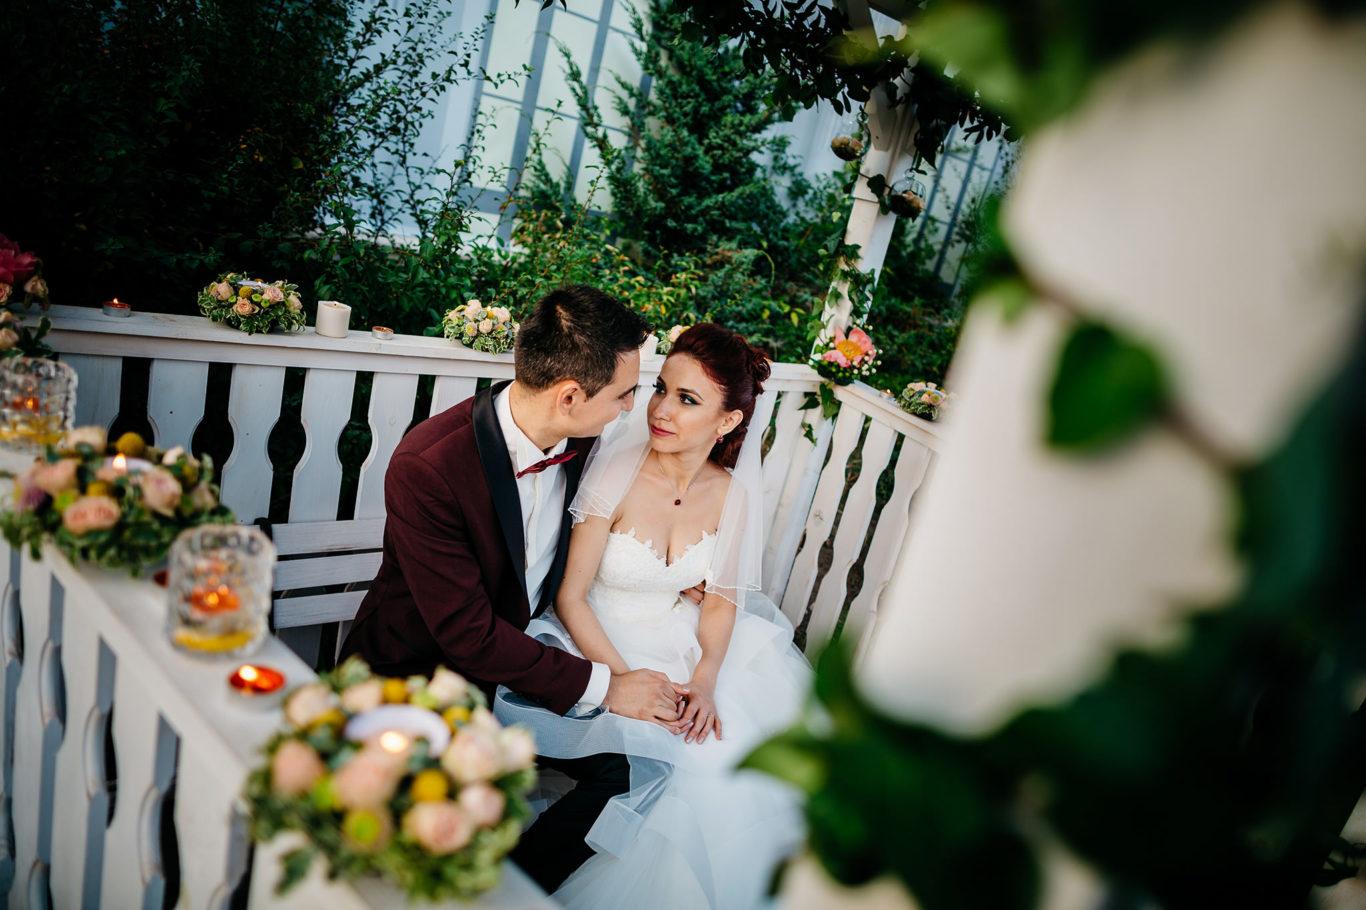 0457-fotografie-nunta-bucuresti-cristina-nicusor-fotograf-ciprian-dumitrescu-dc1_0372